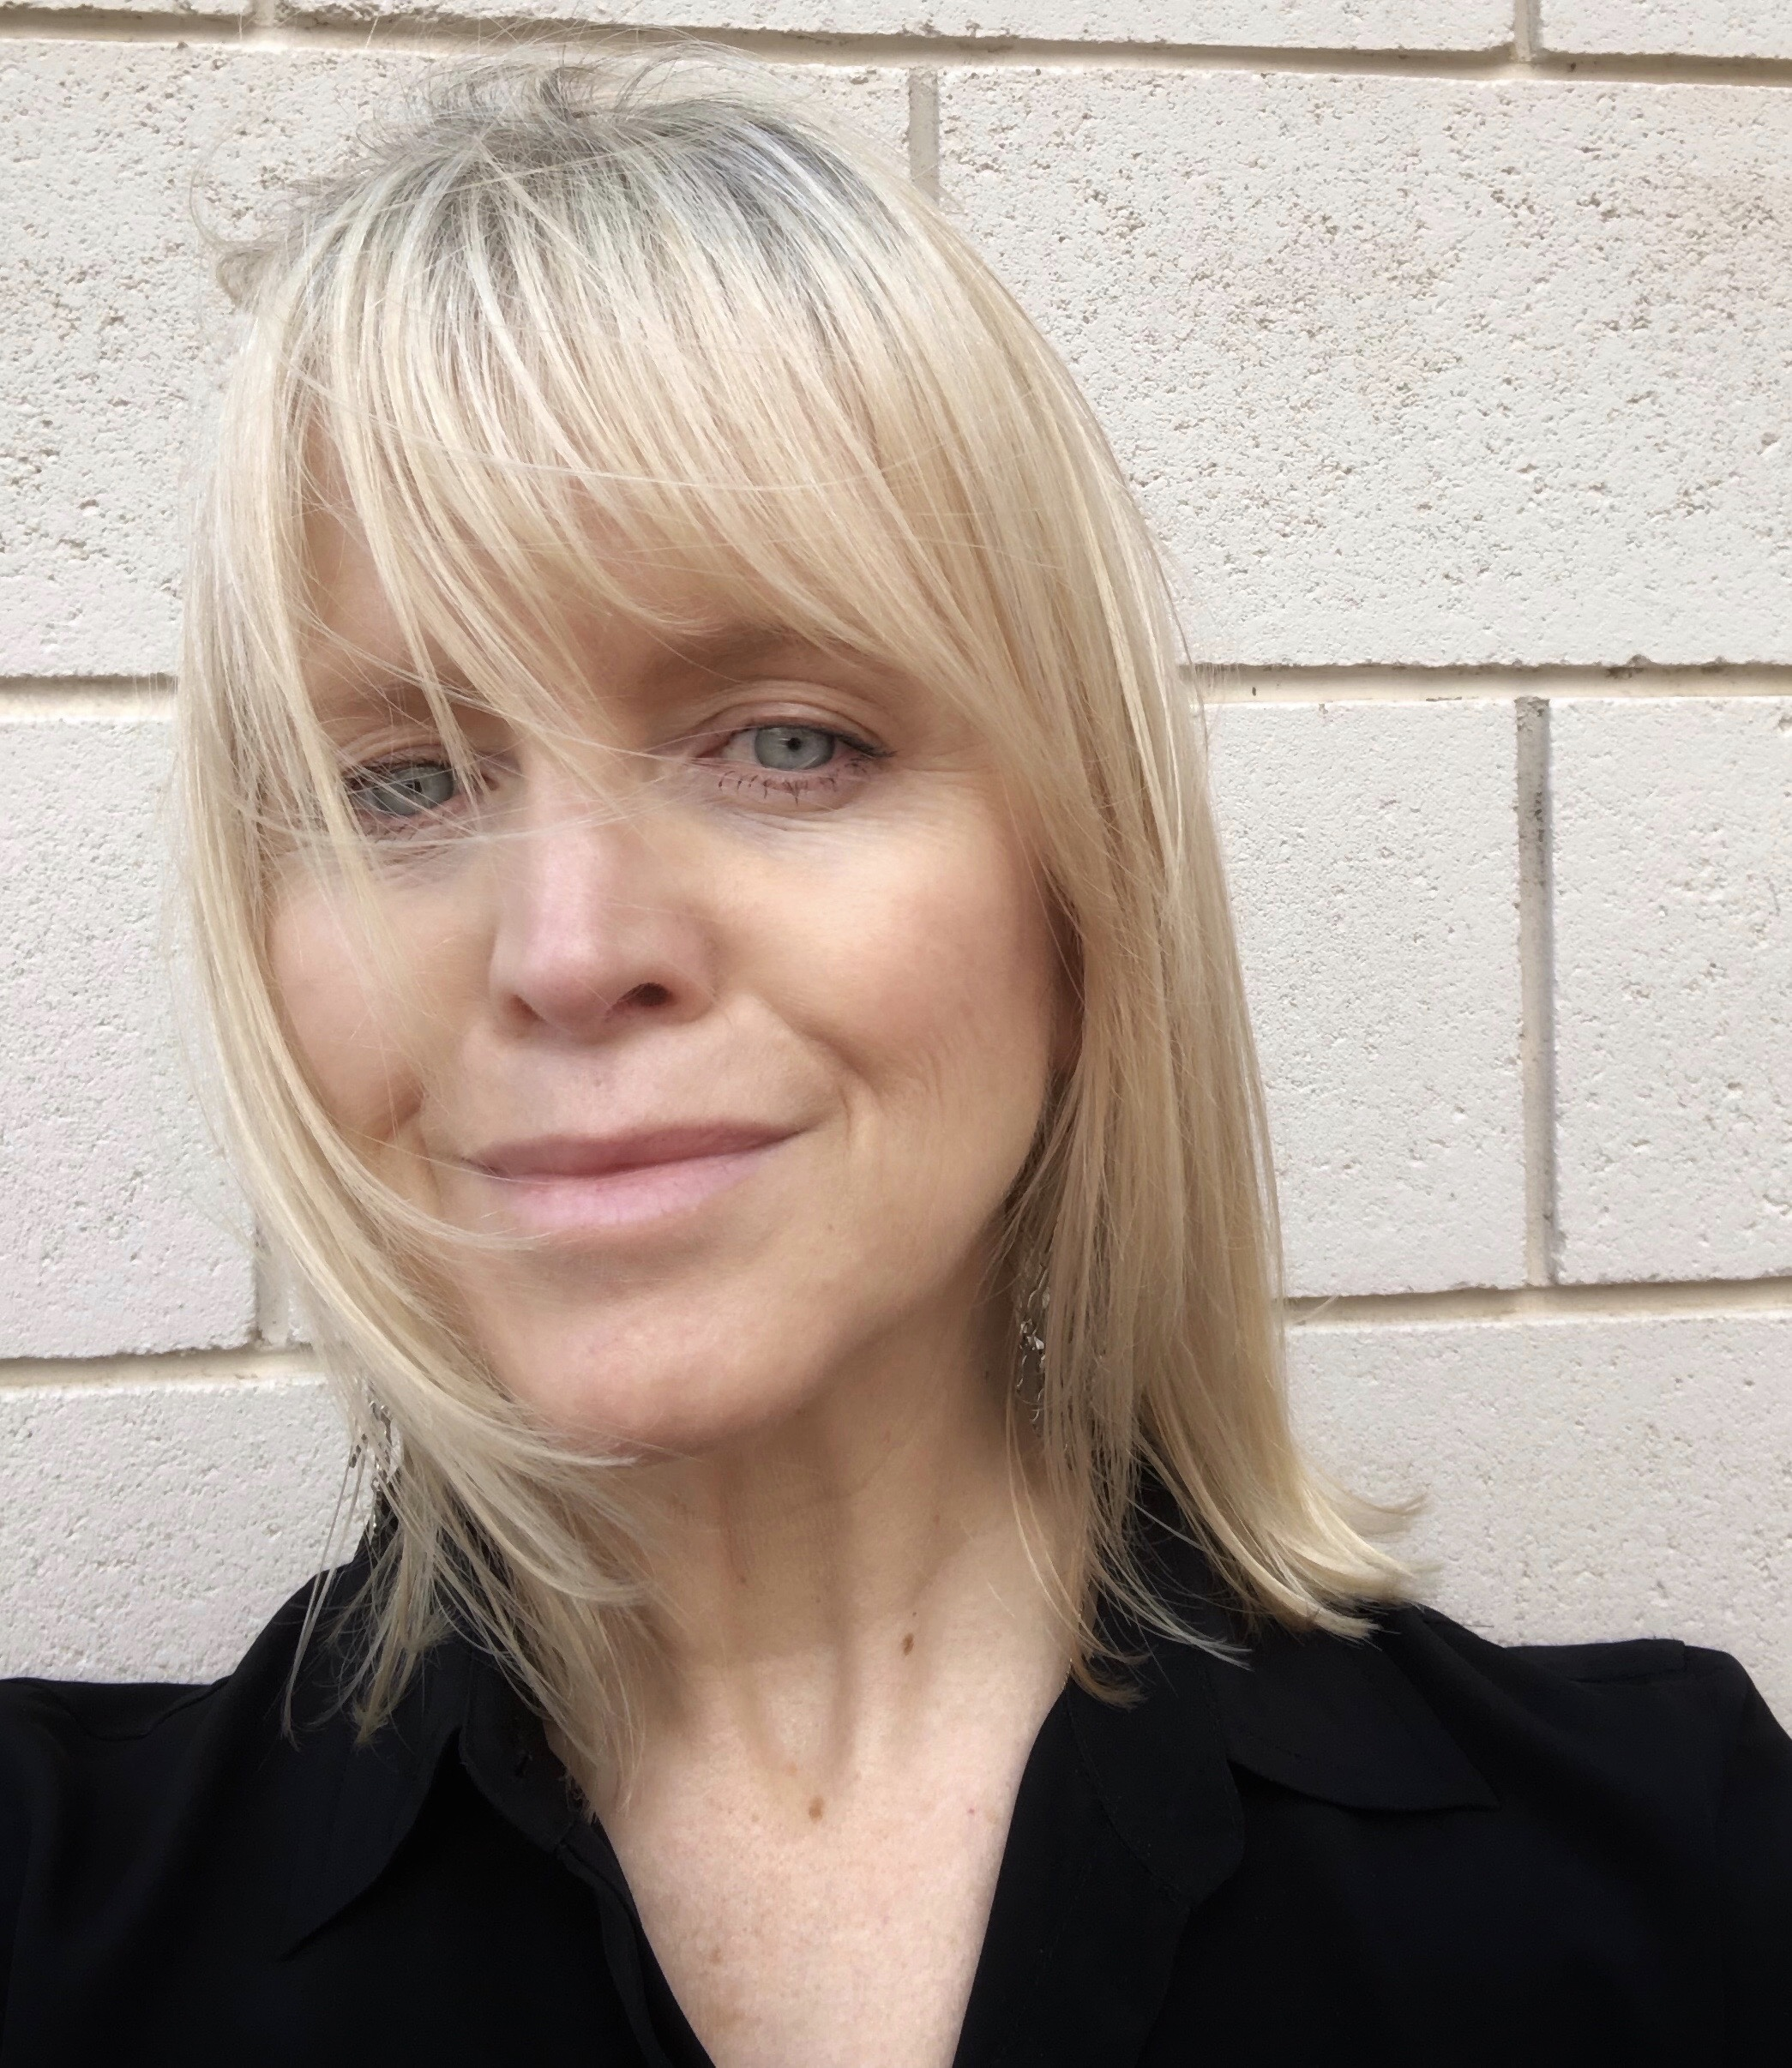 AMANDA DANIEL - FOUNDING DIRECTOR